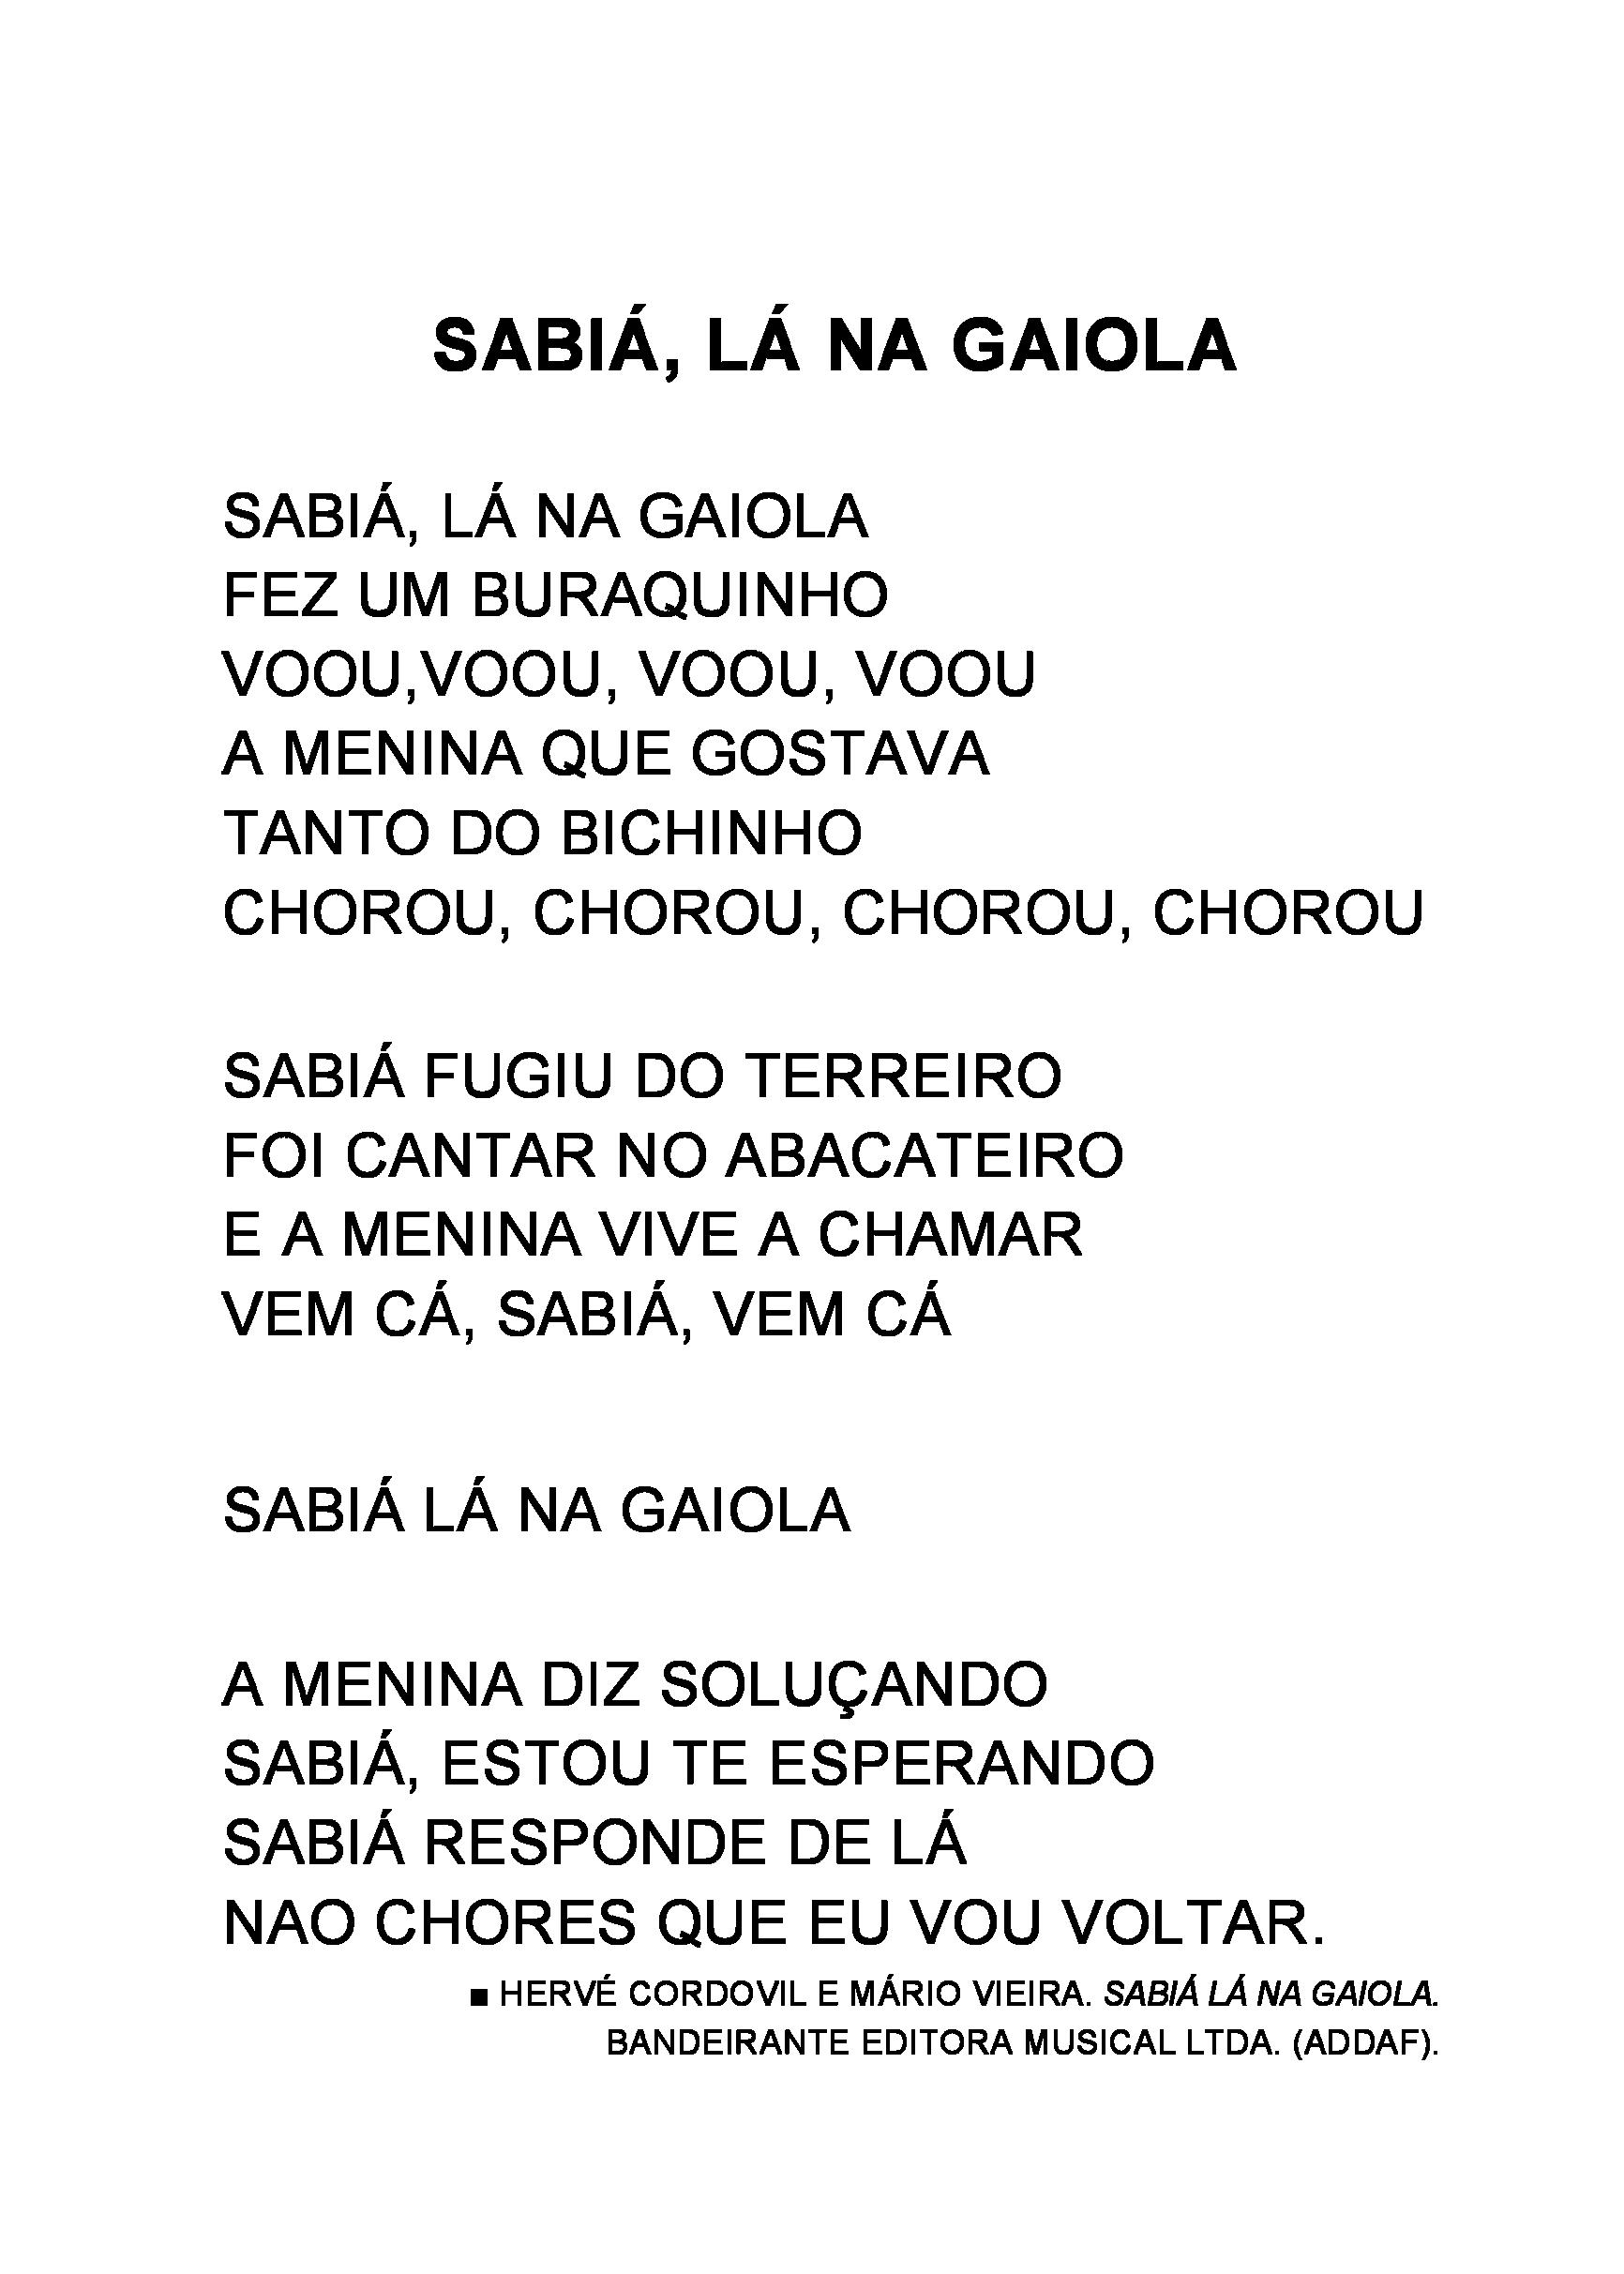 0148-texto-alfabetizacao-sabia-gaiola